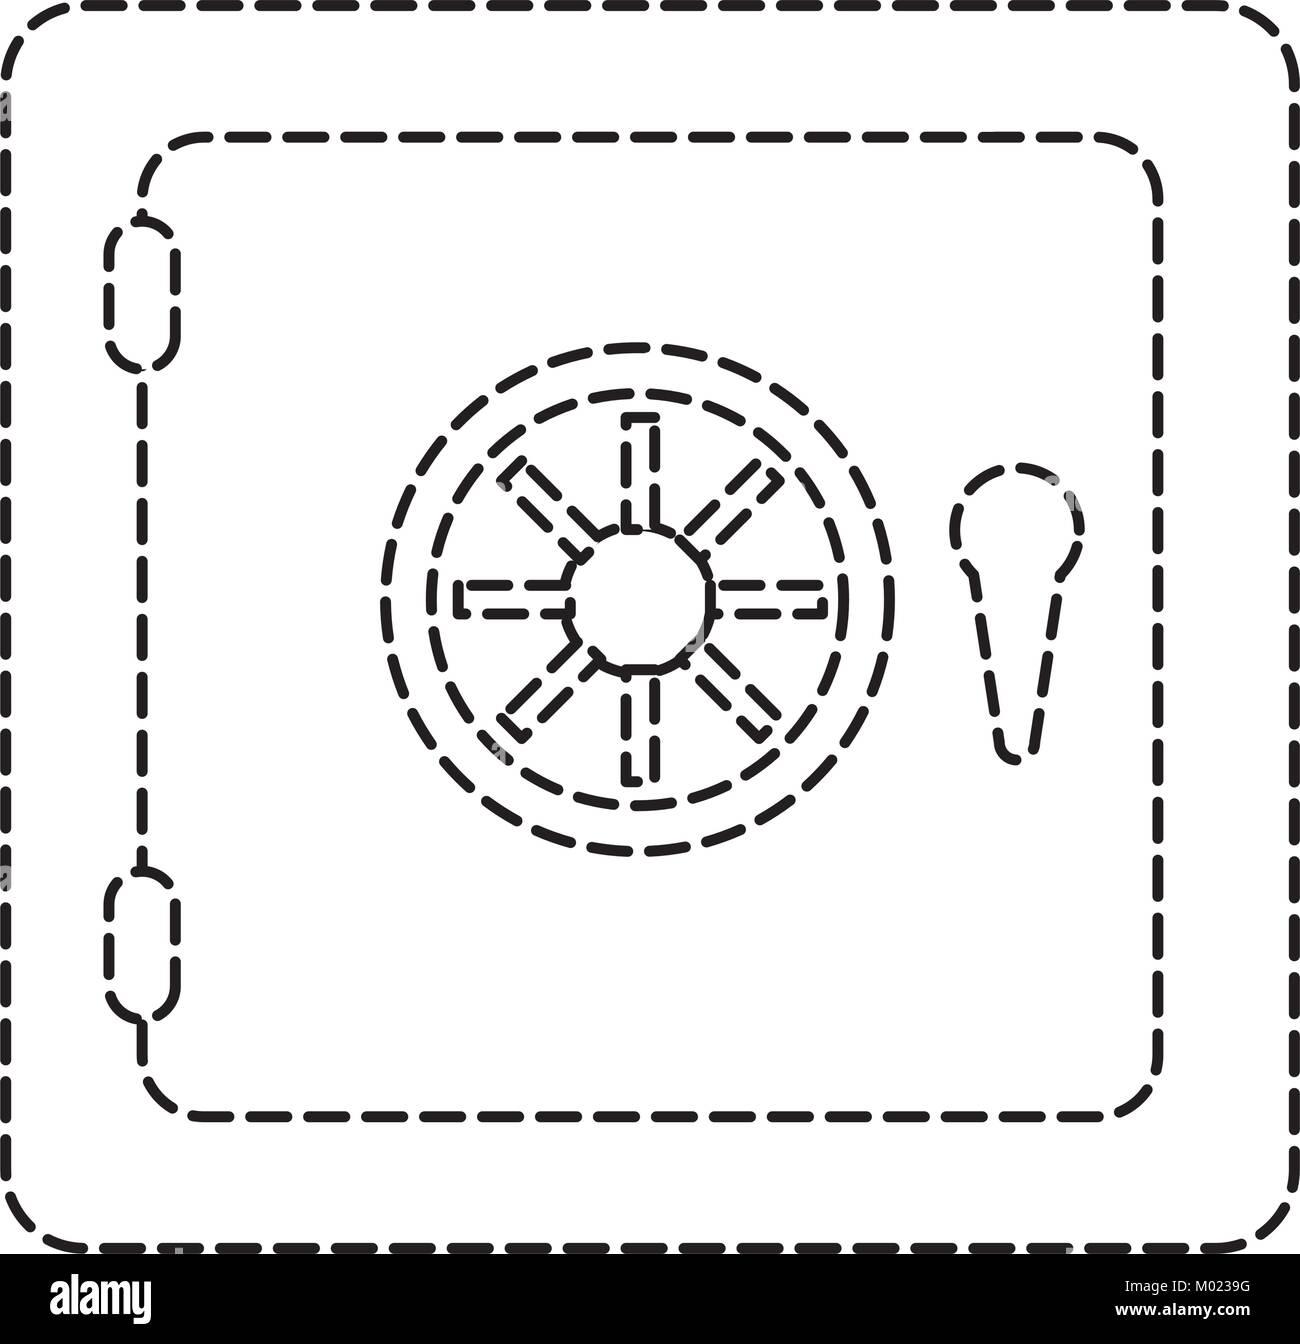 safe vector illustration - Stock Image